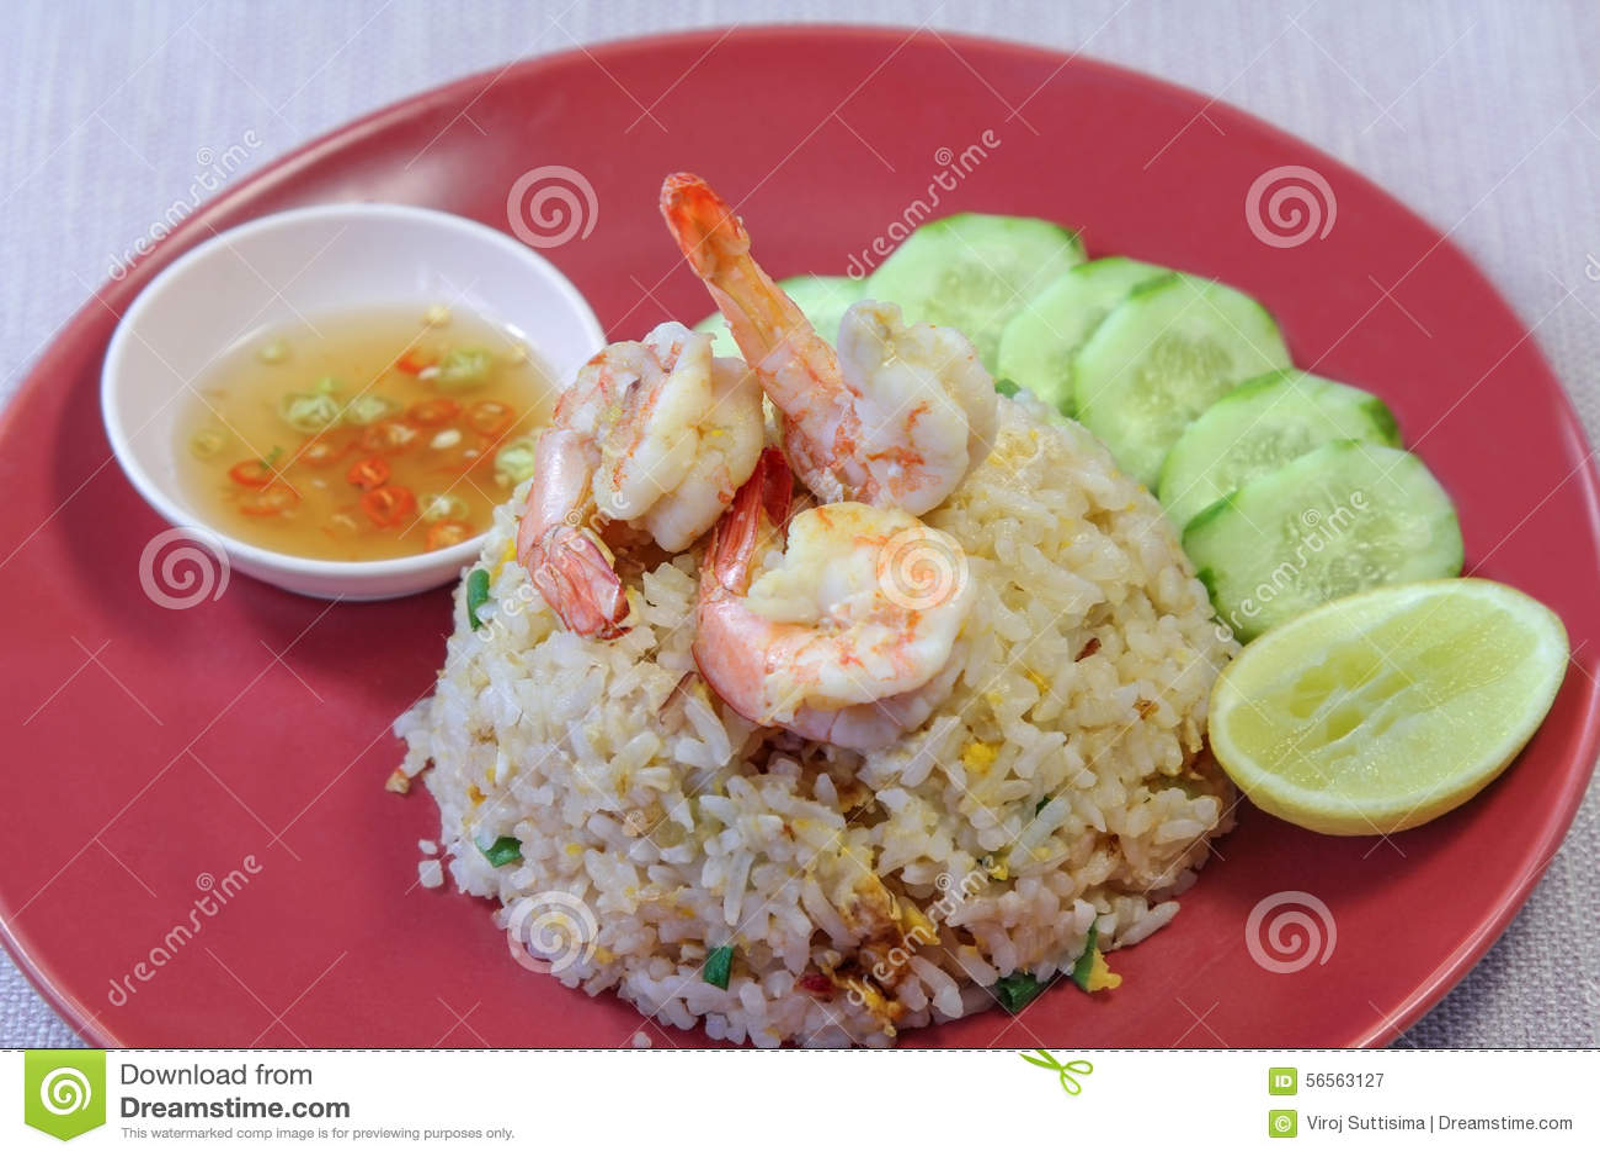 Download Τηγανισμένο γαρίδες ρύζι, τρόφιμα Στοκ Εικόνα - εικόνα από σιτάρι, ψάρια: 56563127